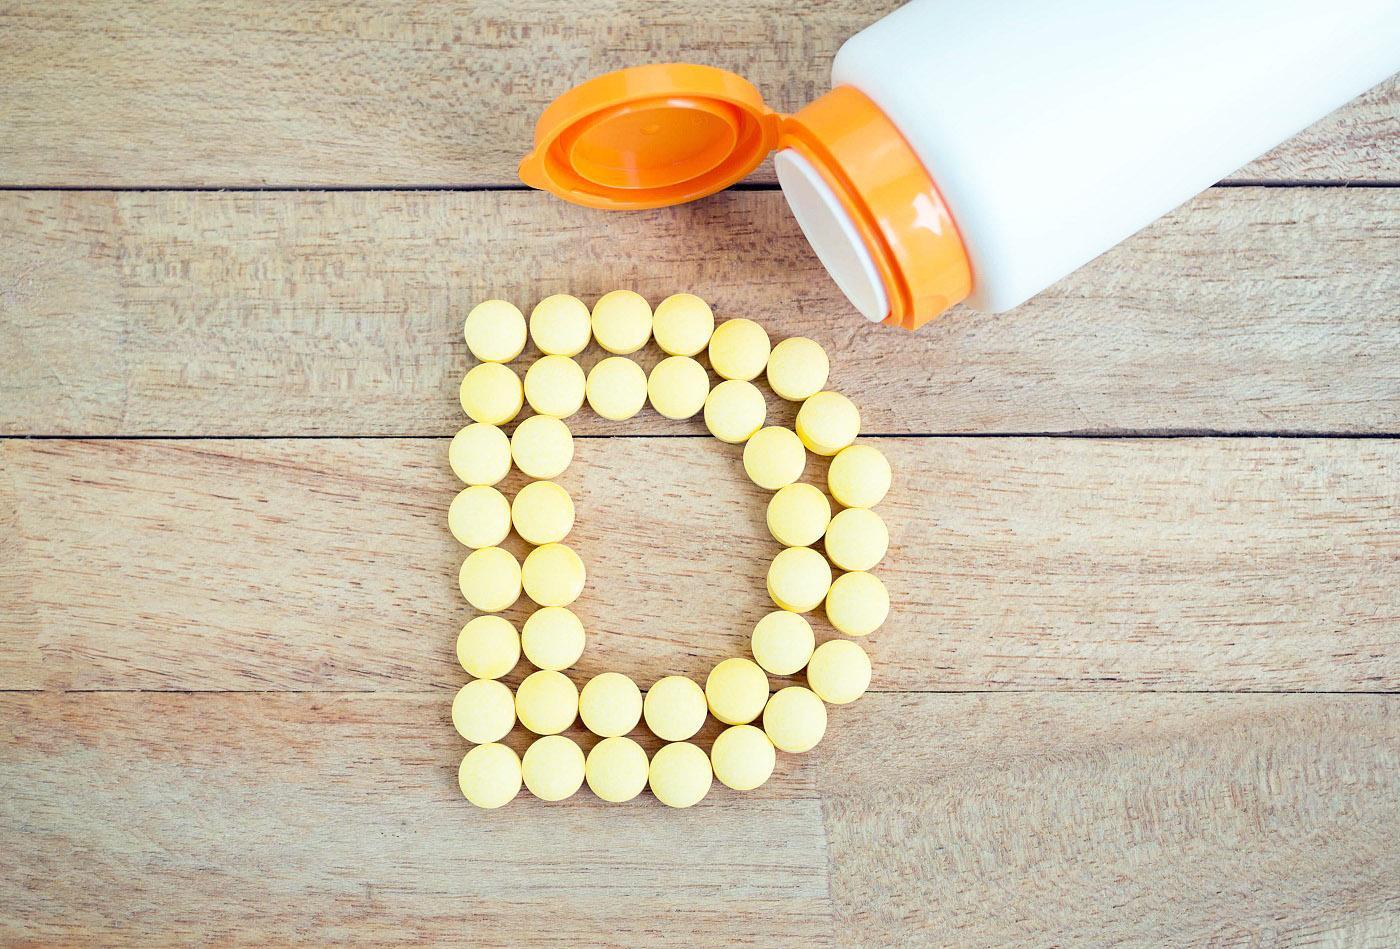 Врачи связали нехватку витамина D с повышенным риском заполучить COVID